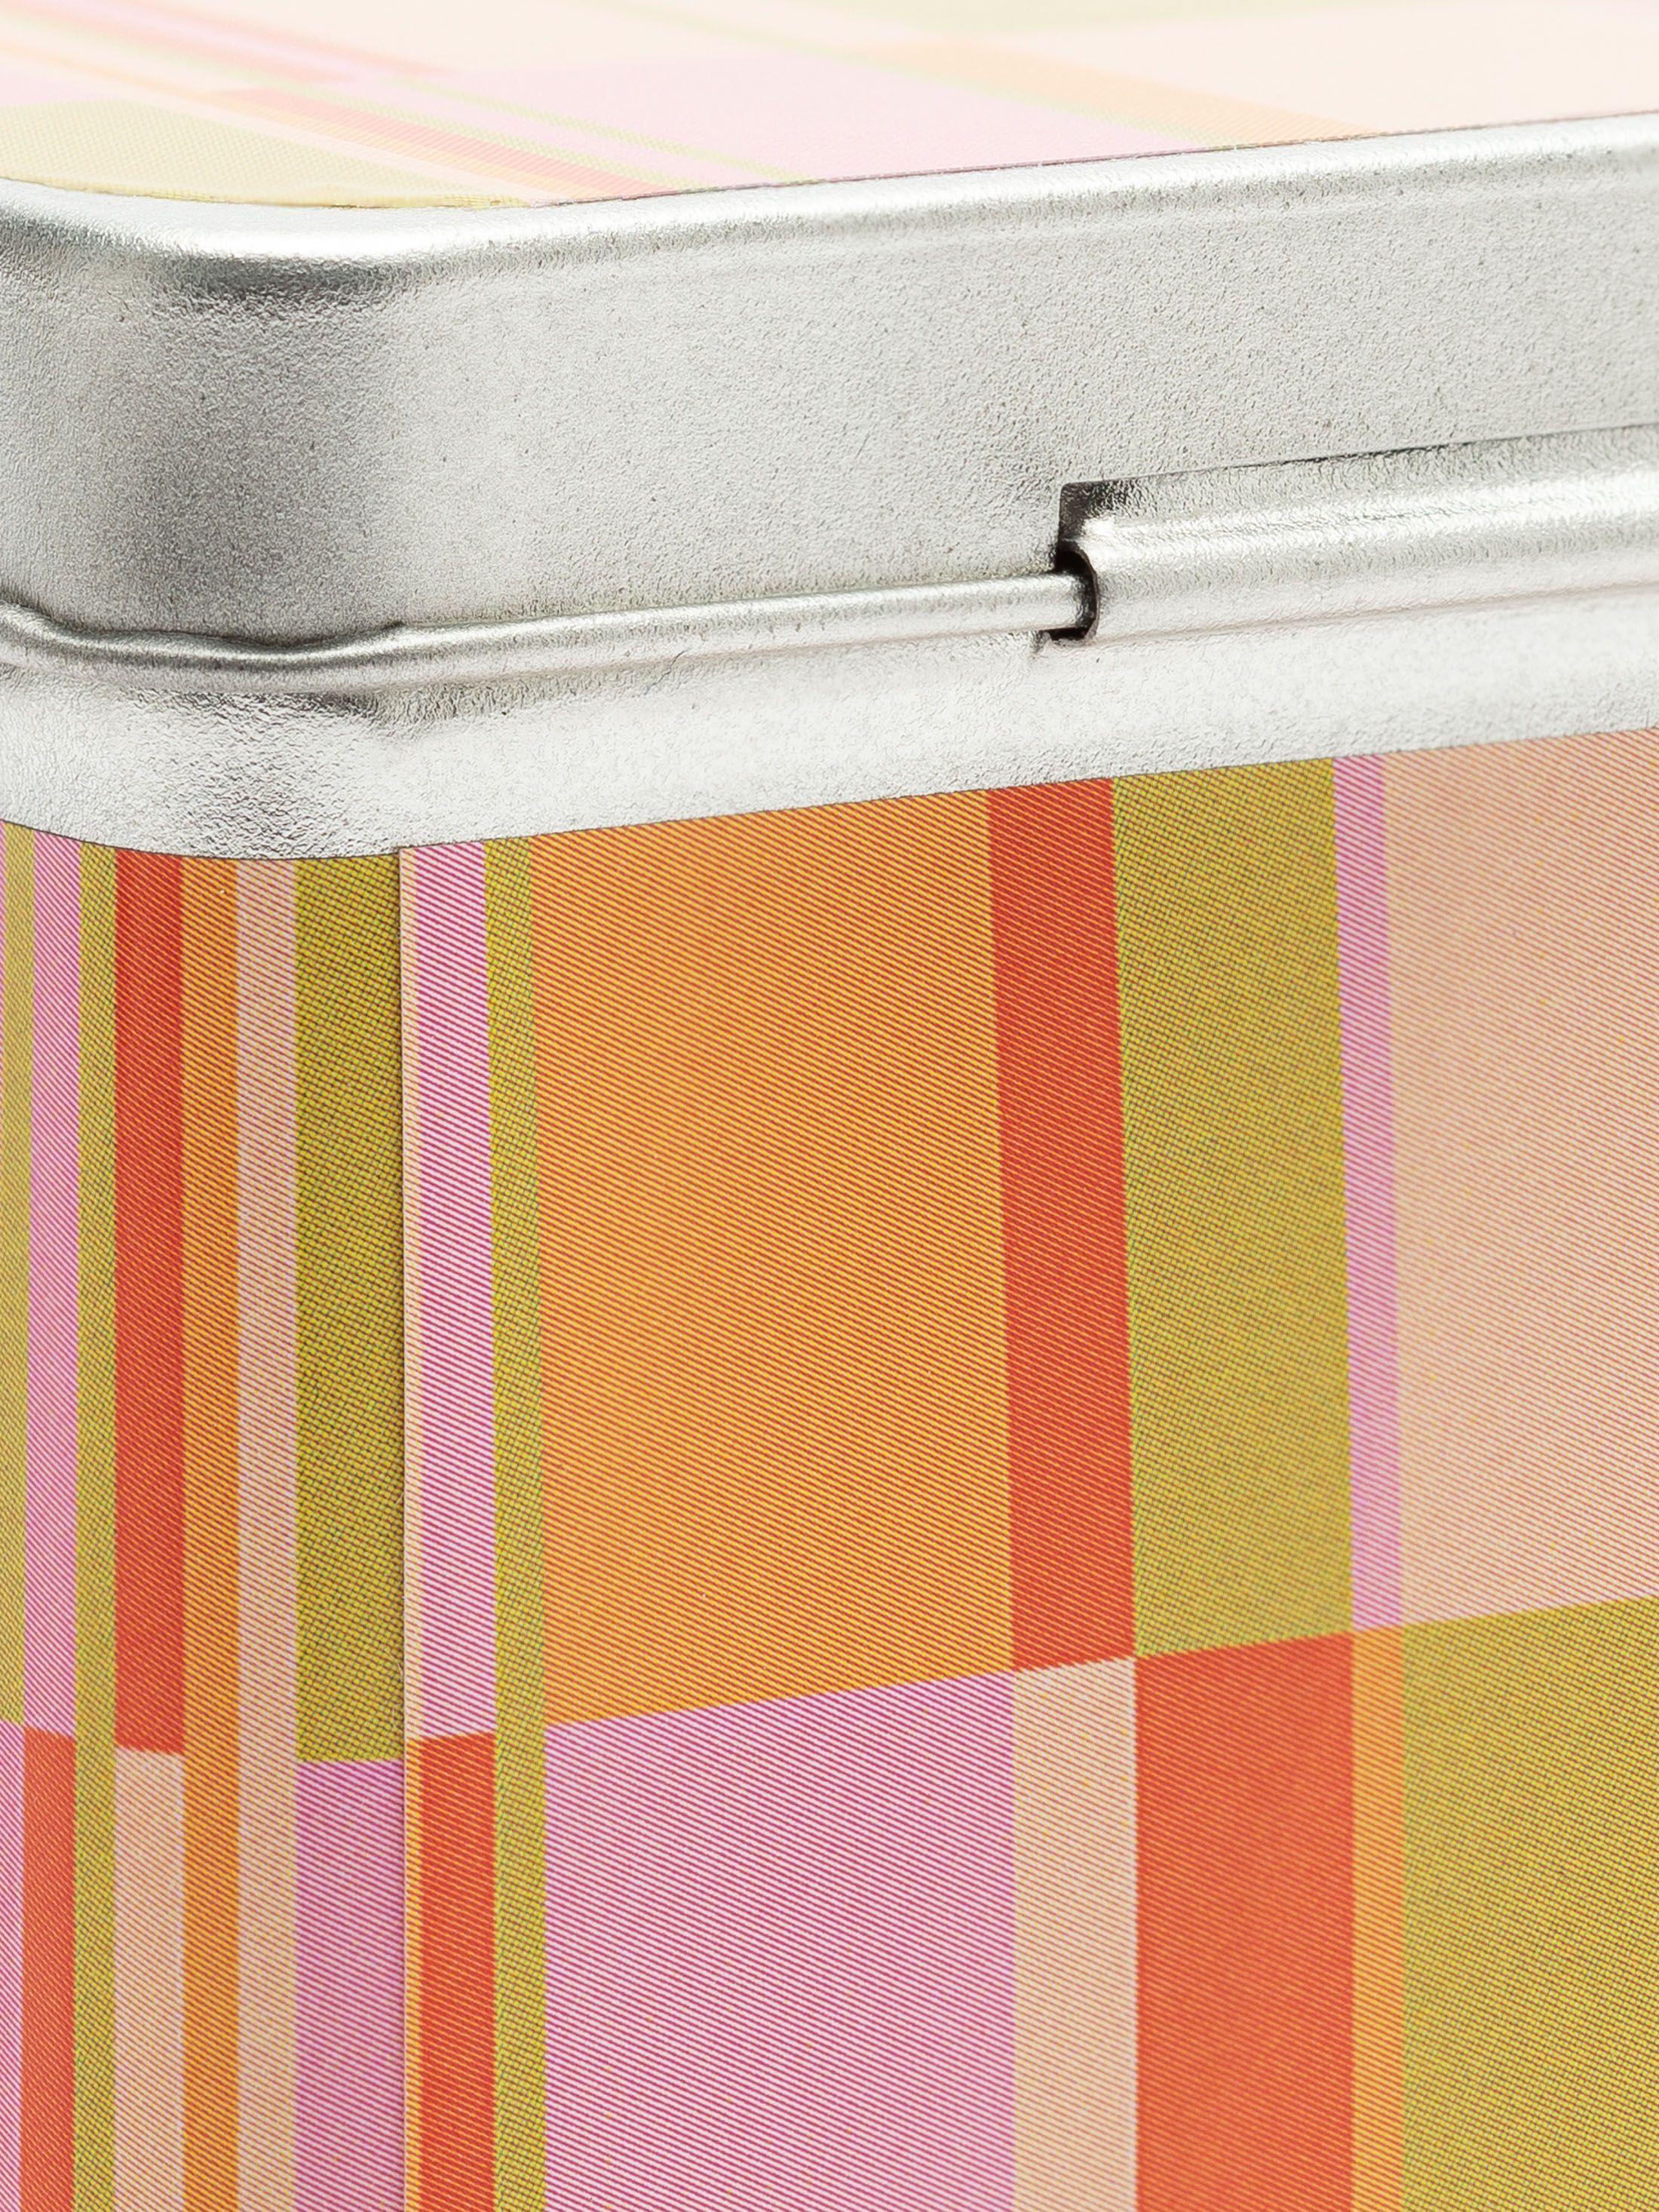 teedosen bedruckt mit zwei verschiedenen design